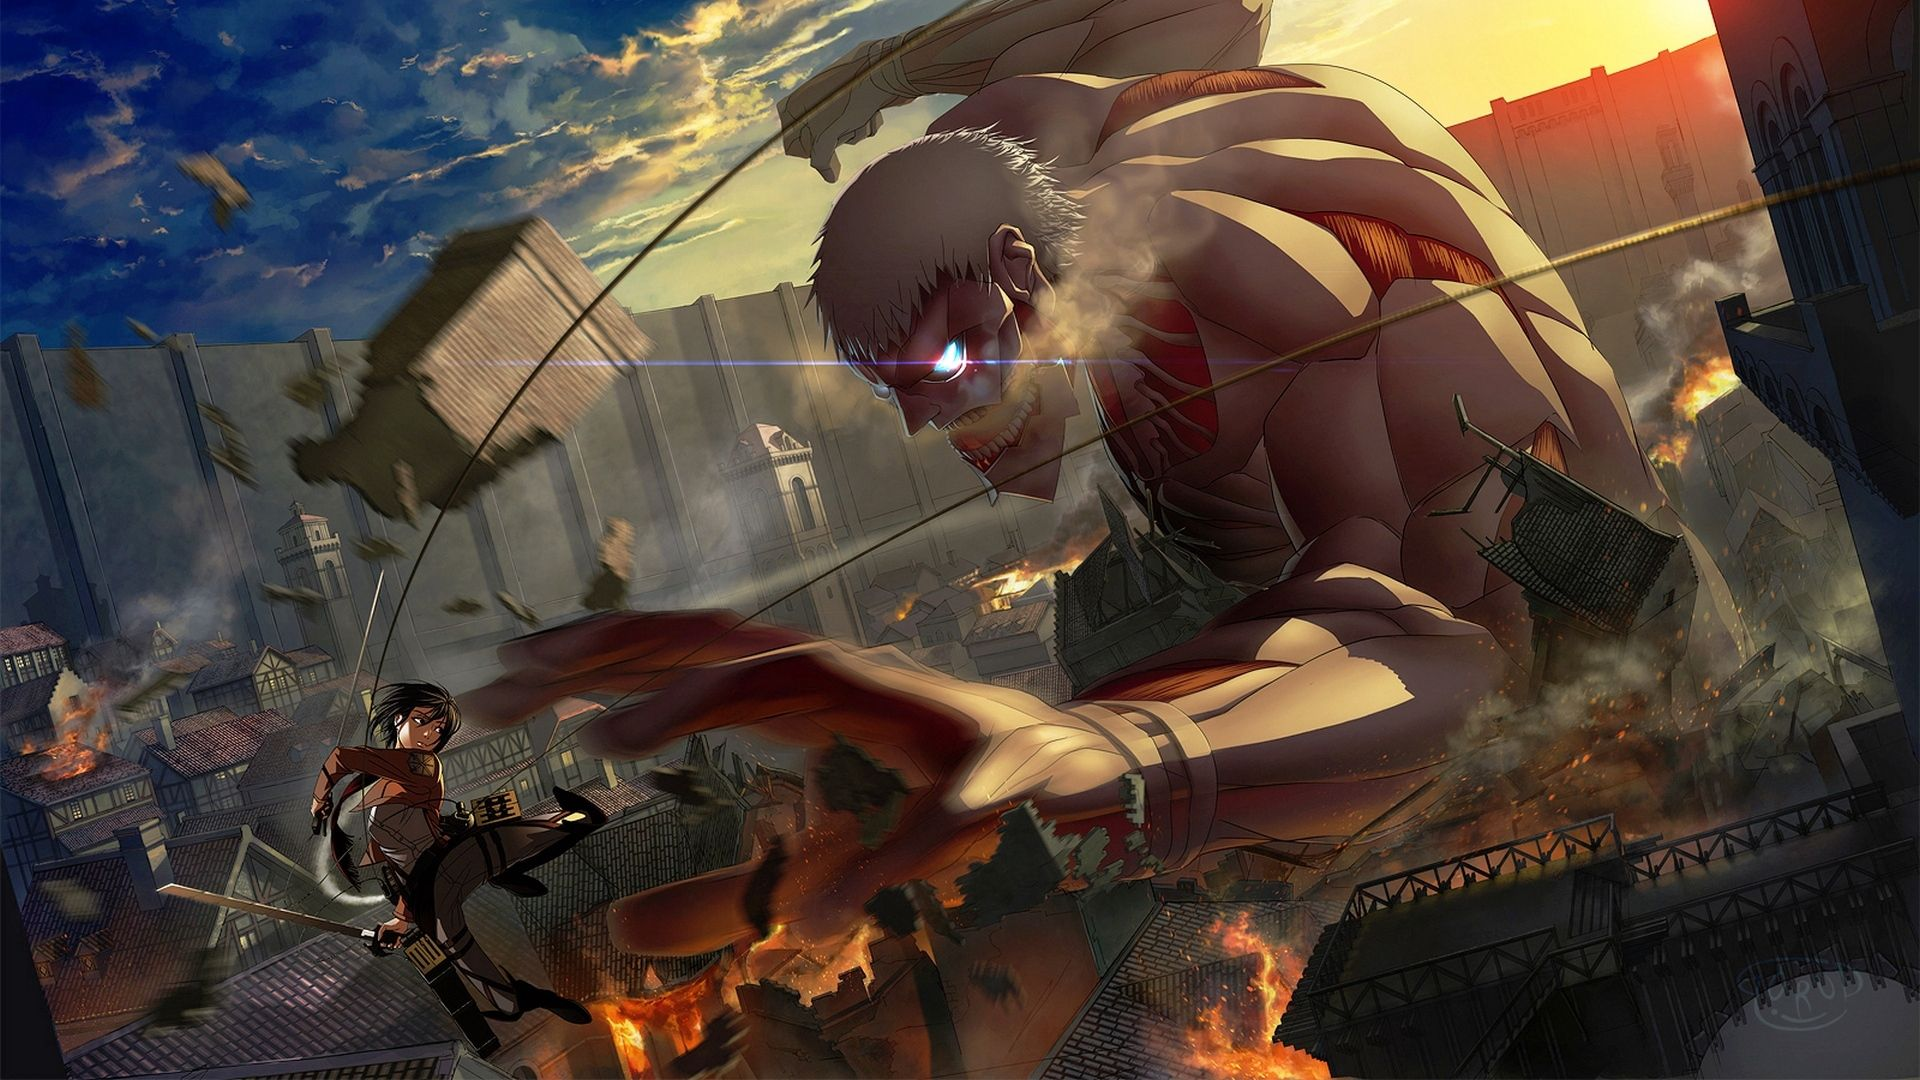 1920x1080 Wallpaper Mikasa Ackerman Shingeki No Kyojin Battle Papel De Parede Anime Attack On Titan Tita Encouracado